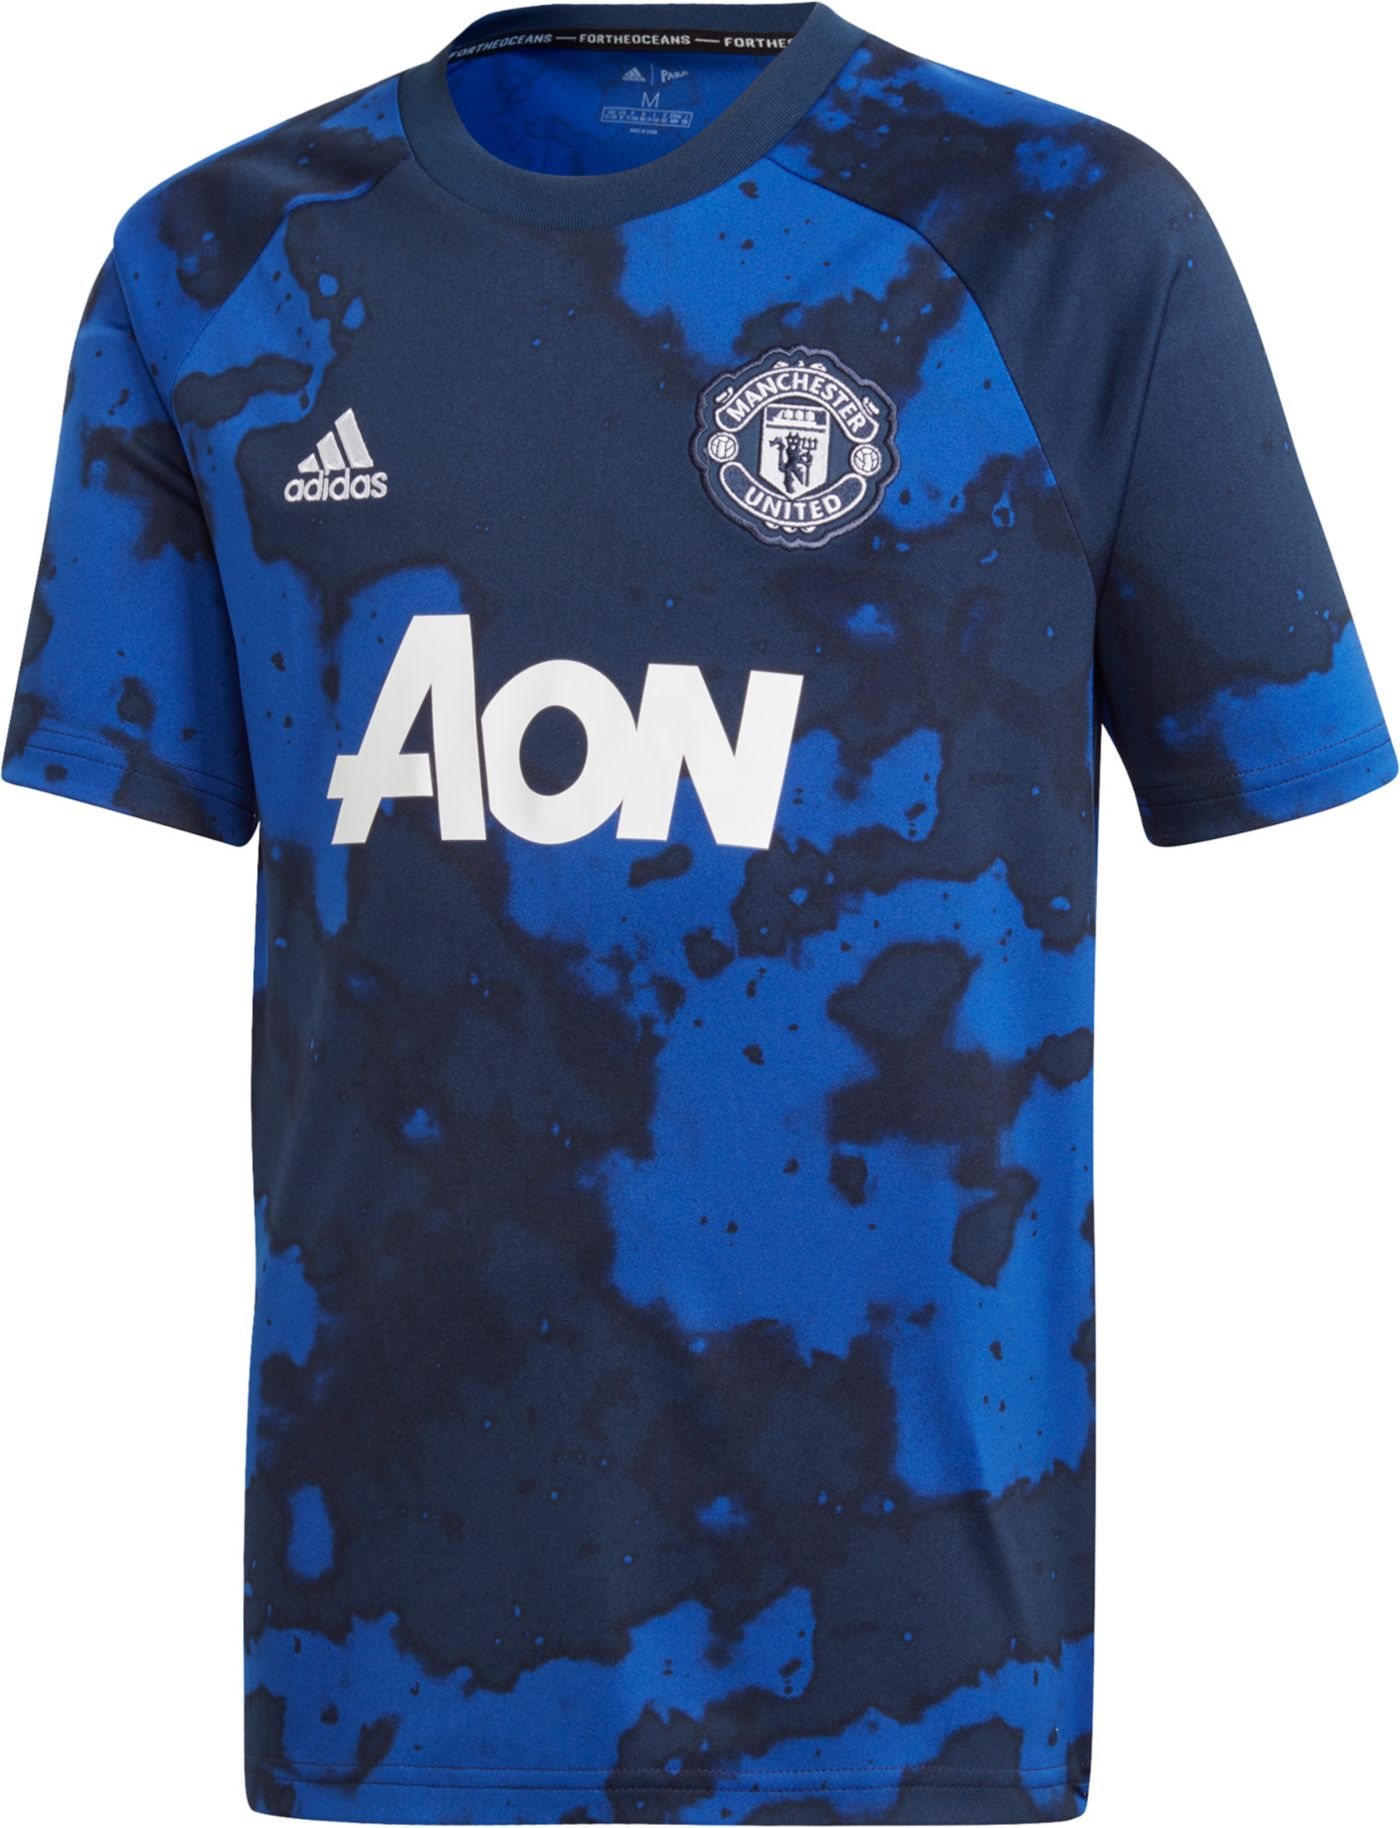 adidas Youth Manchester United Blue Preshirt